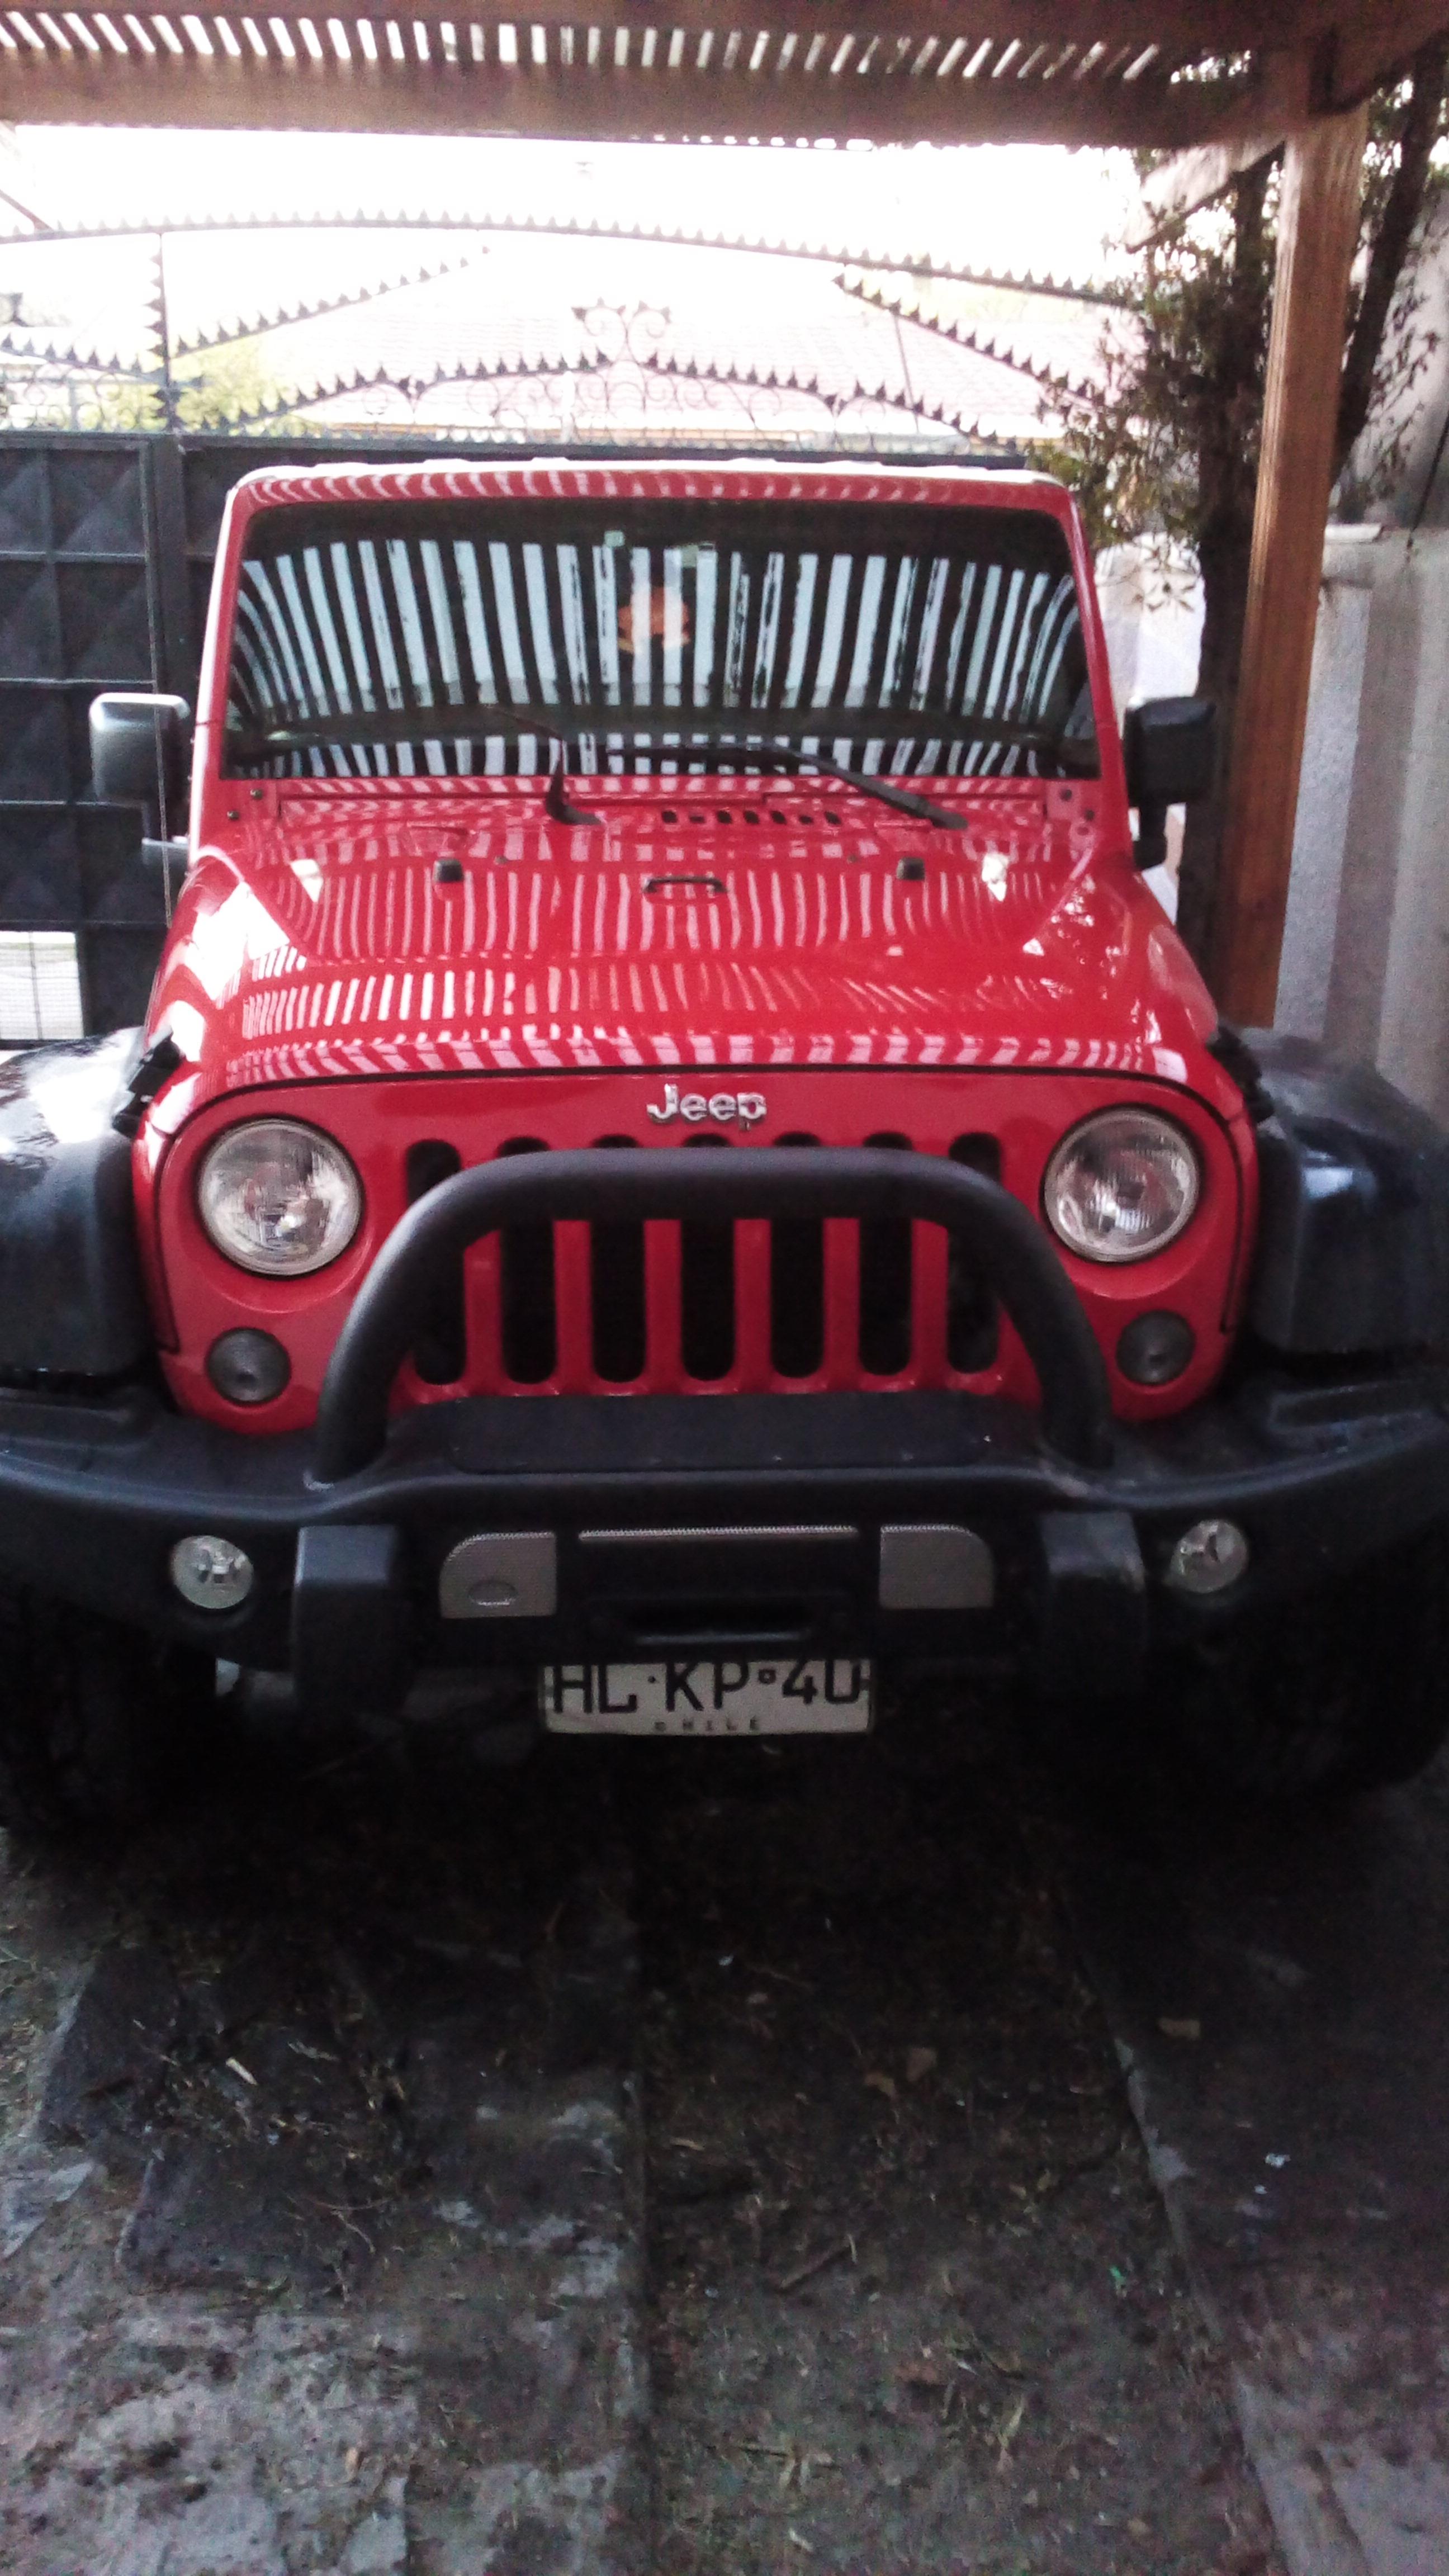 Jeep Wrangler unlimite 3.6 año 2016